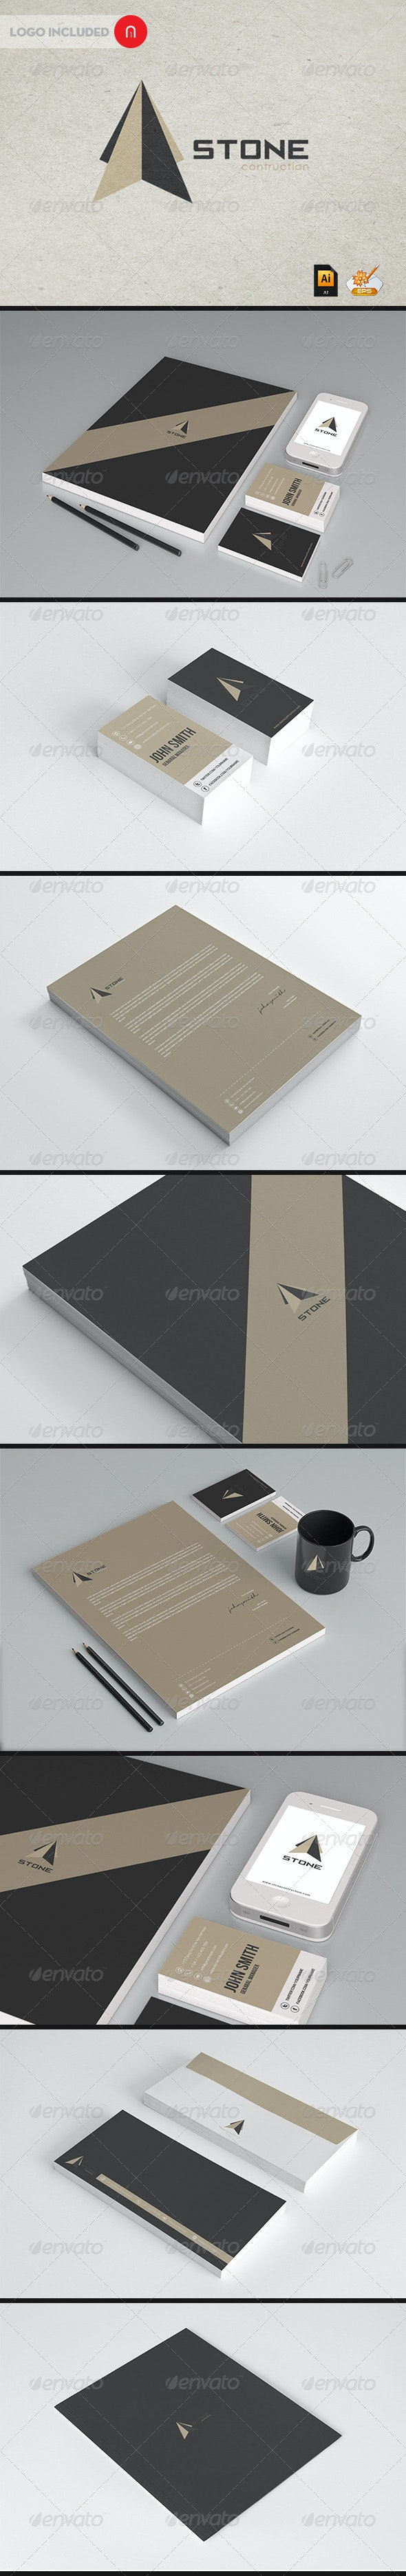 Stationary & Identity - Stone contructions - Stationery Print Templates